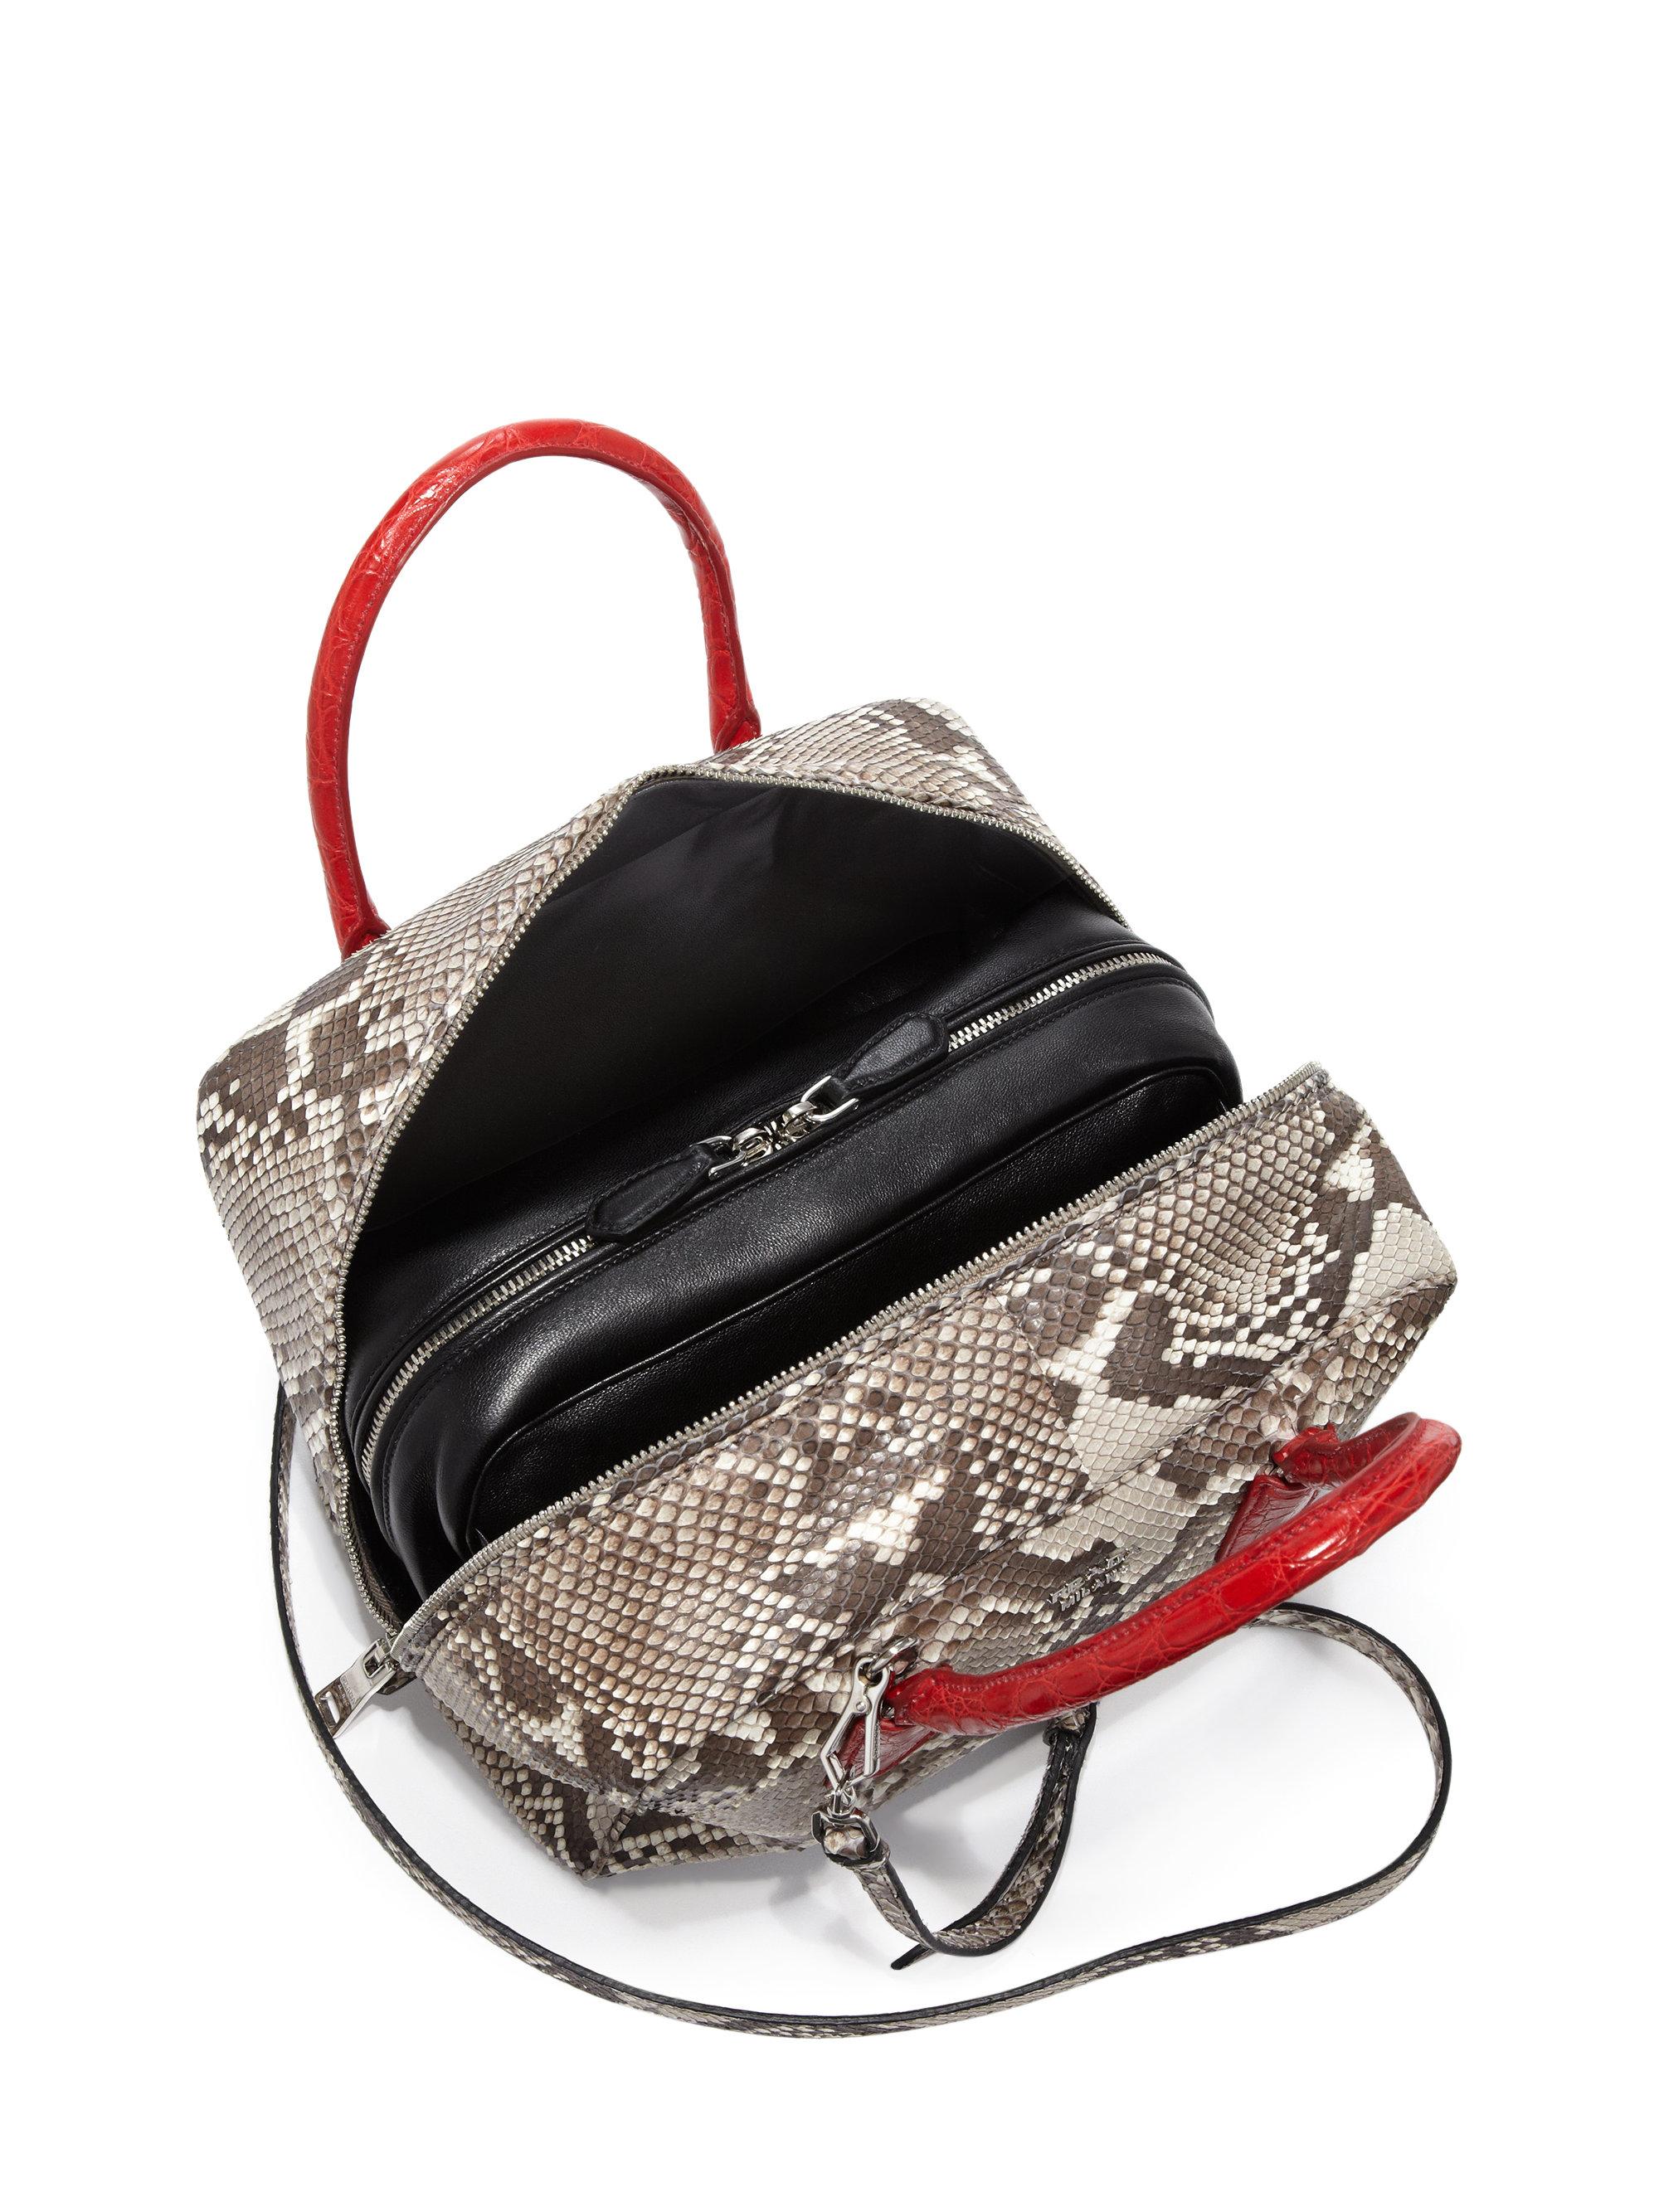 Prada Python \u0026amp; Crocodile Inside Bag in Red (natural-red) | Lyst